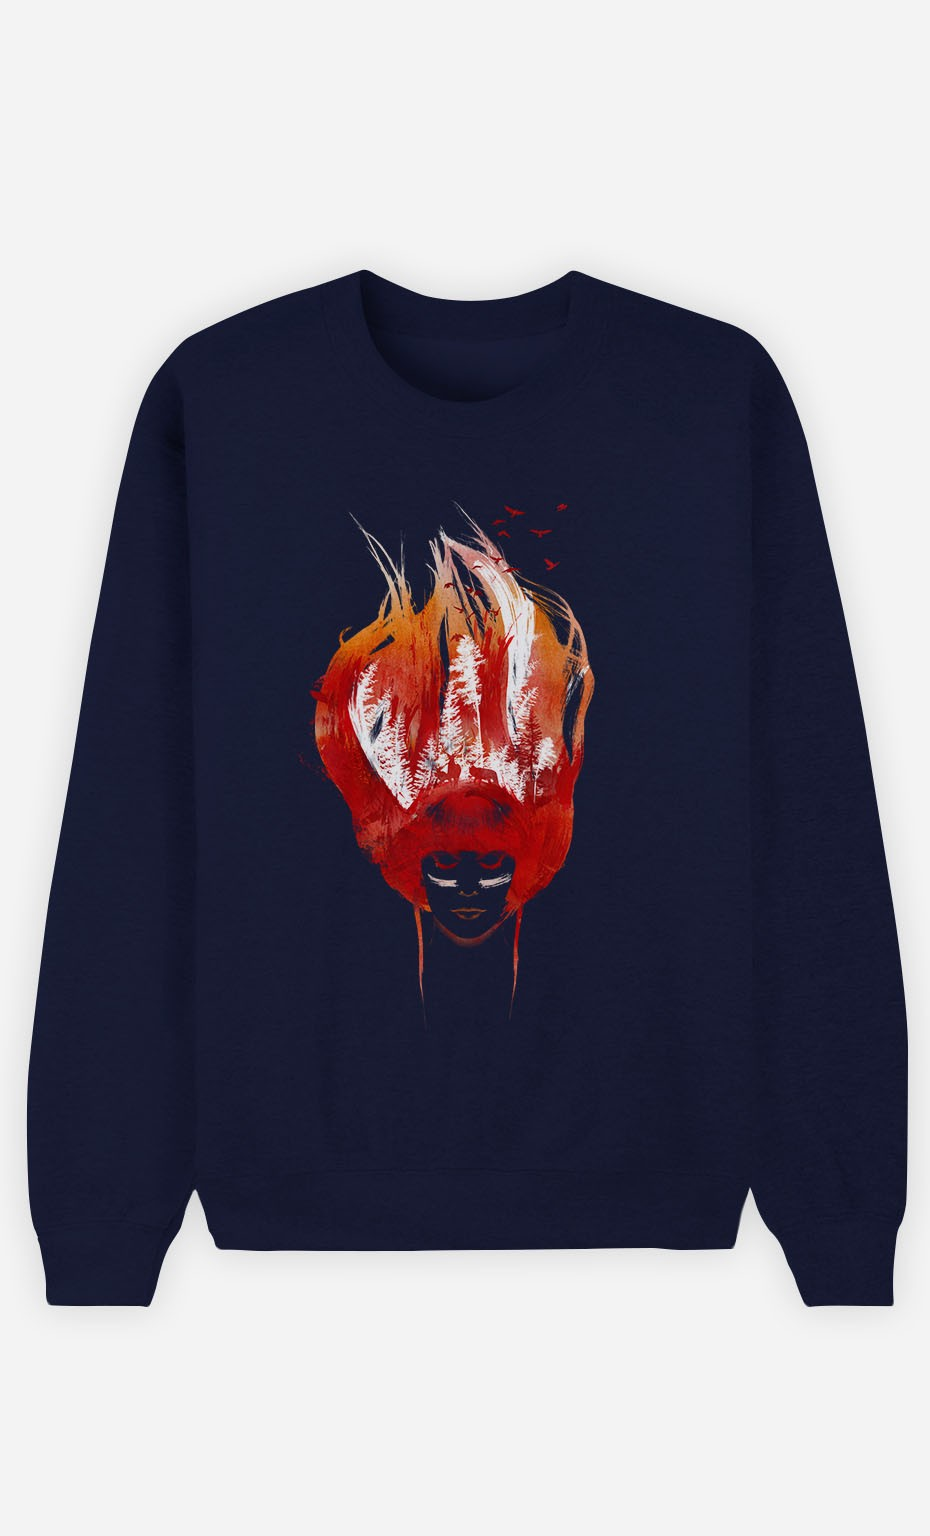 Blue Sweatshirt Burning Forest